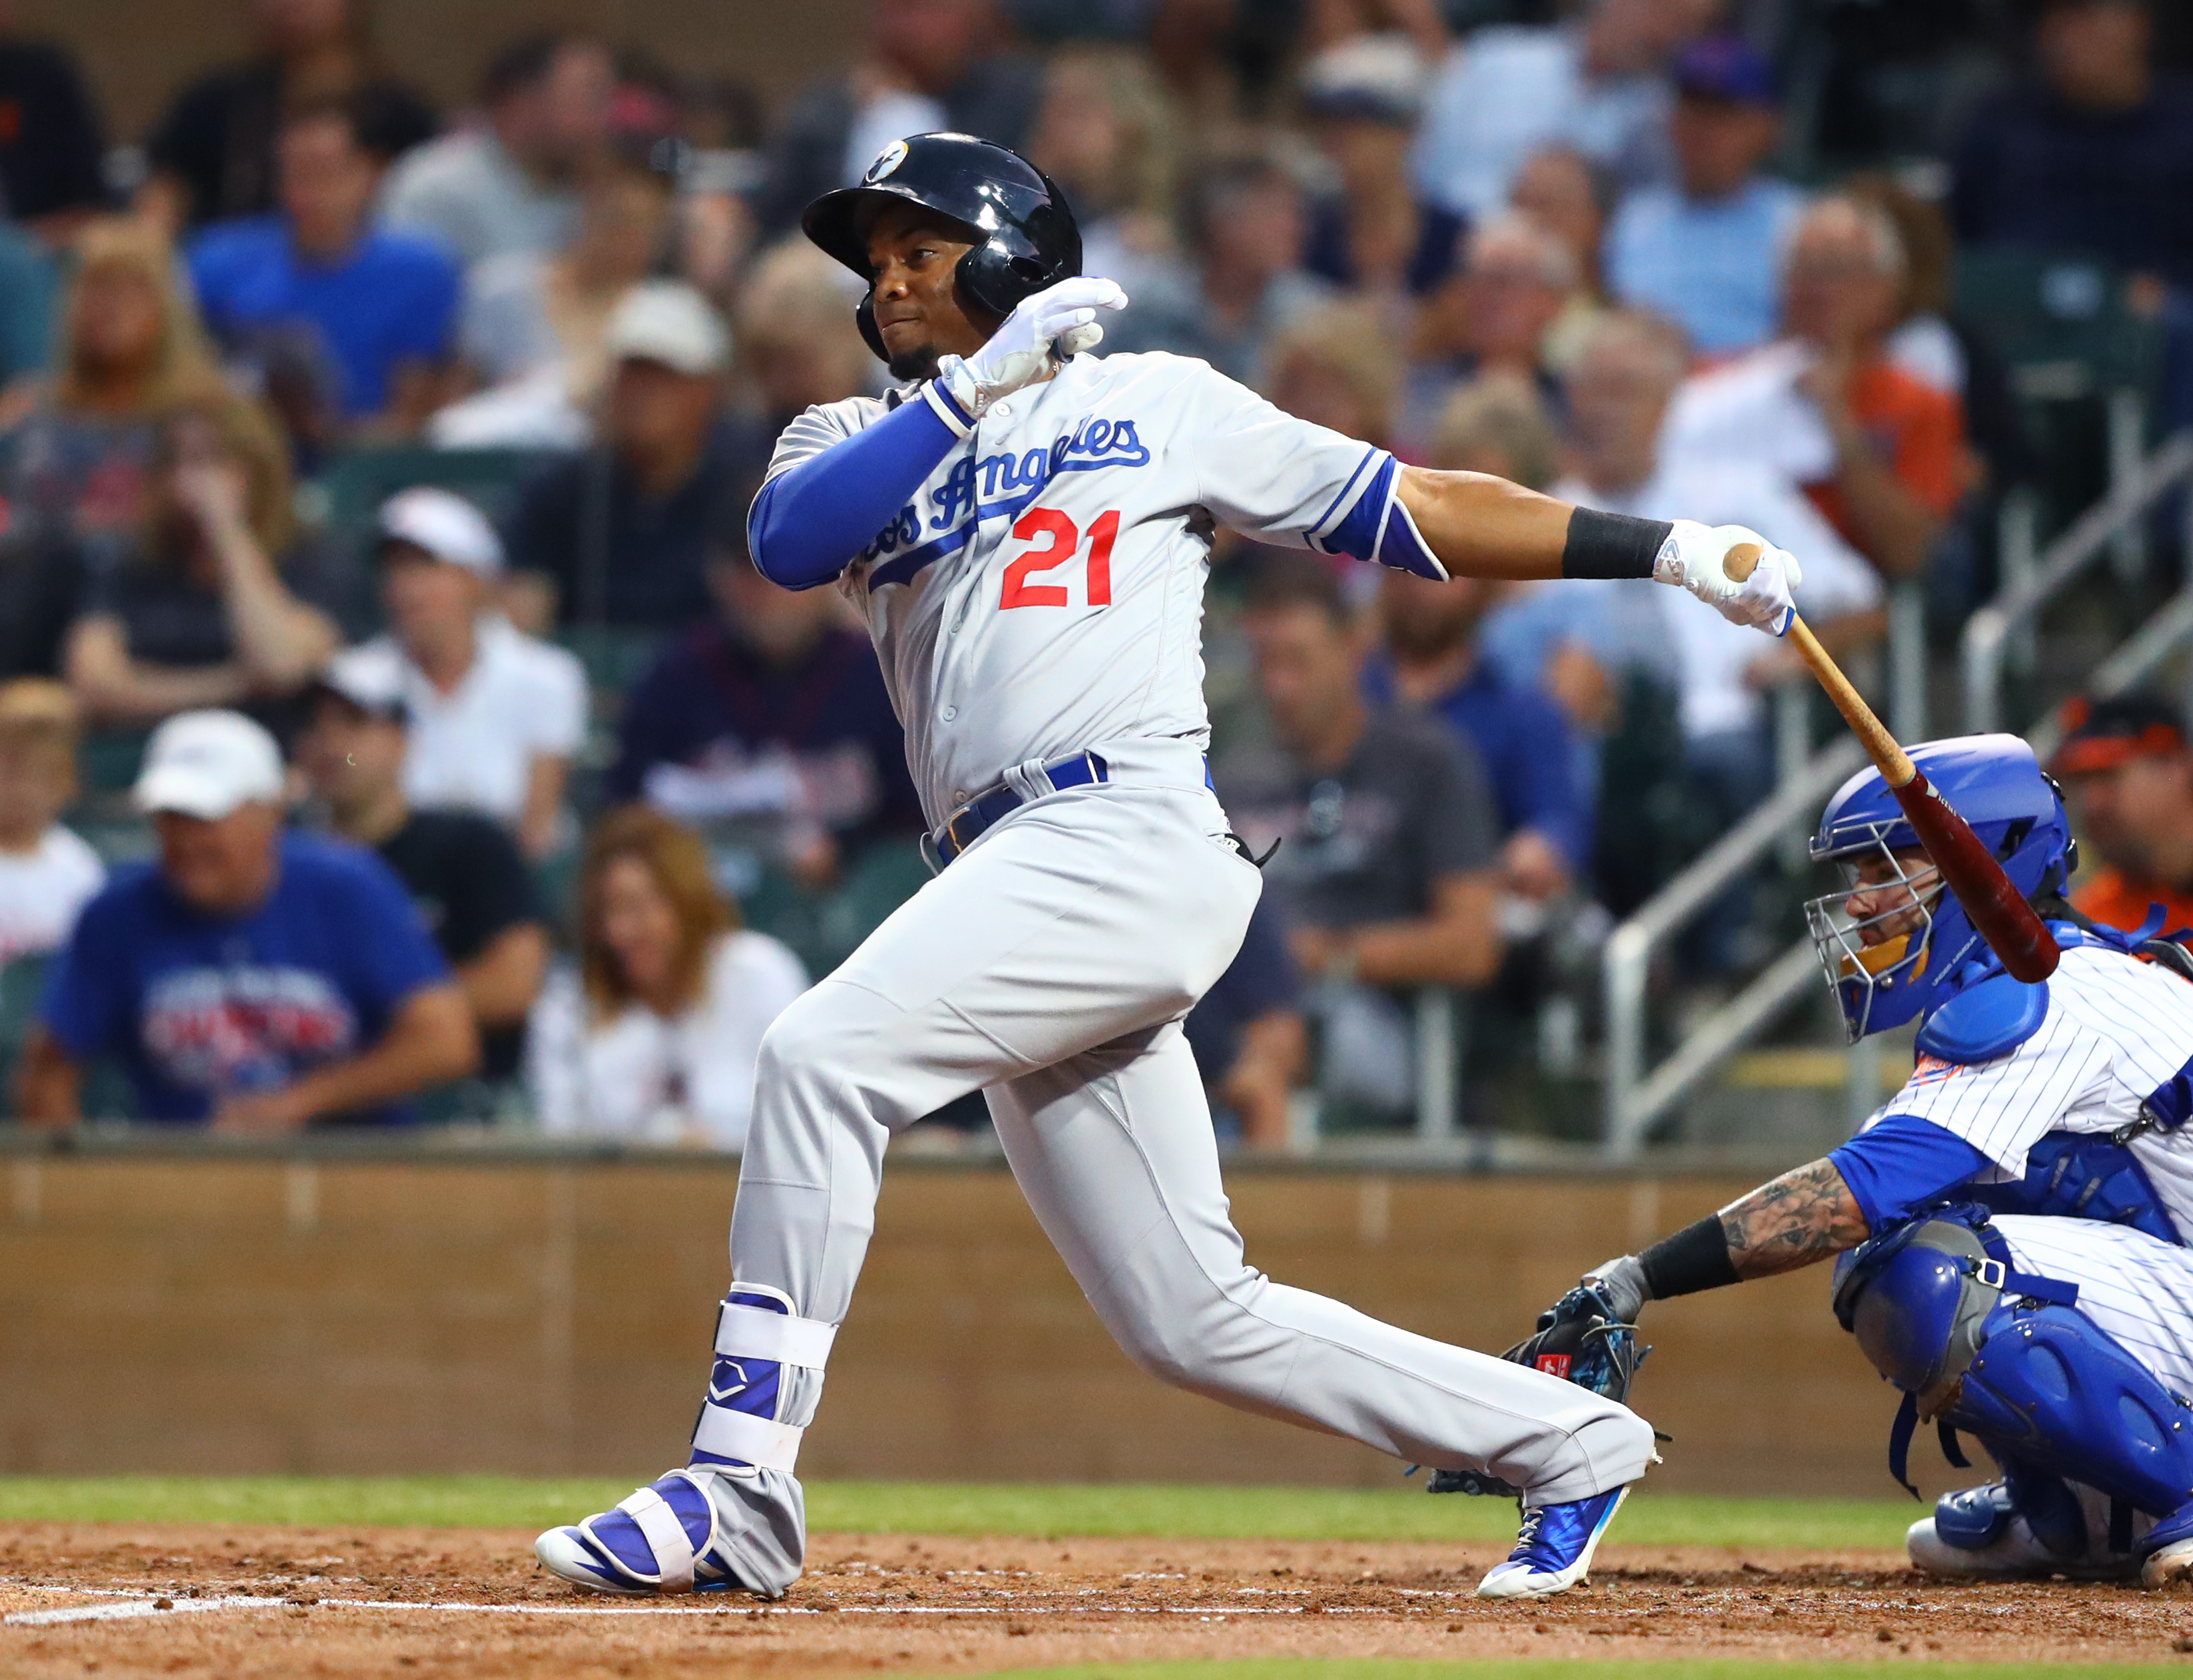 Minor League Baseball: Arizona Fall League-All Star Game